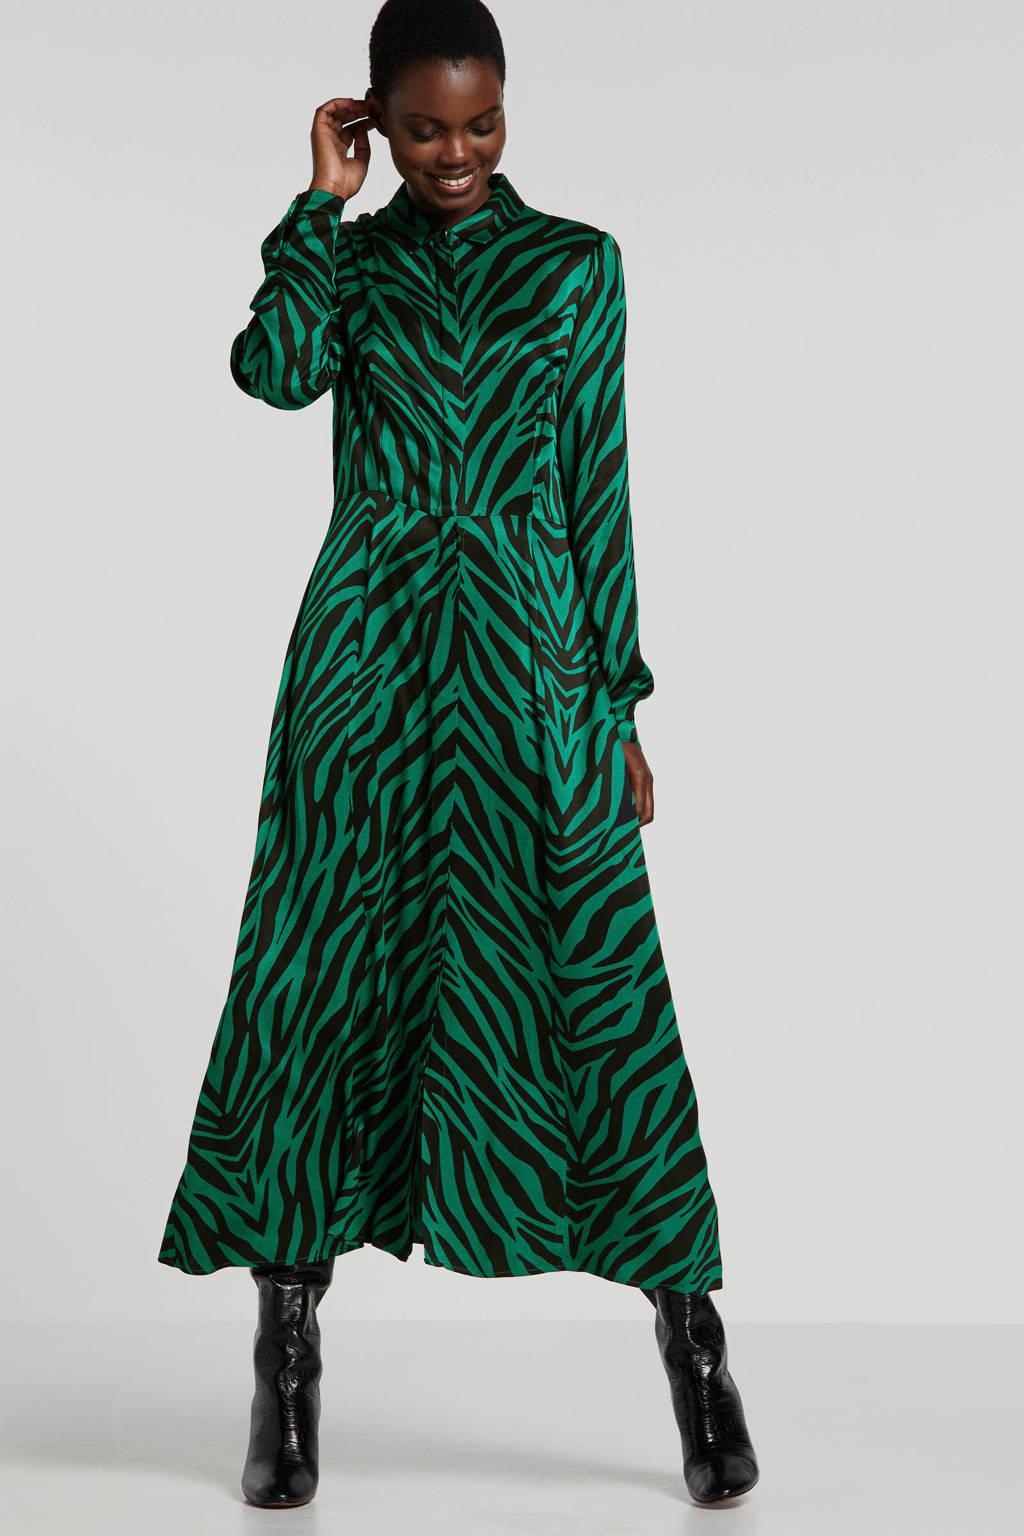 Ruby satijnen maxi jurk met zebraprint groen/zwart, Groen/zwart